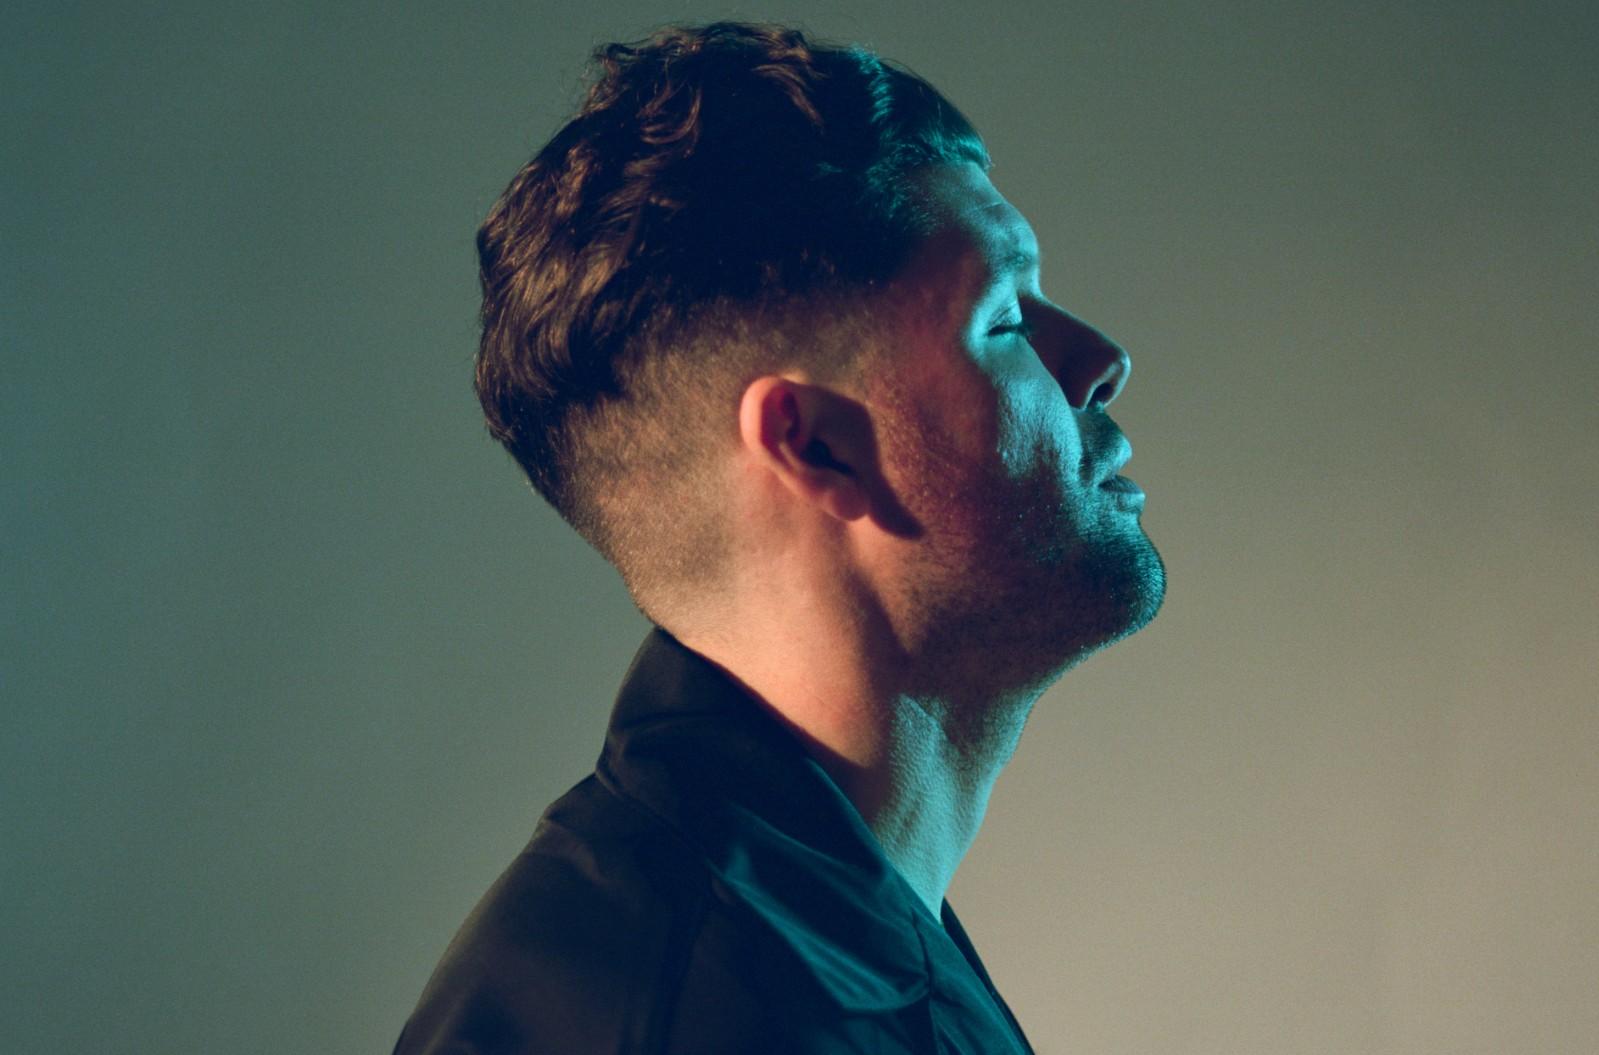 Daniel Merriweather Lets It 'Rain' In New Music Video: Exclusive Premiere